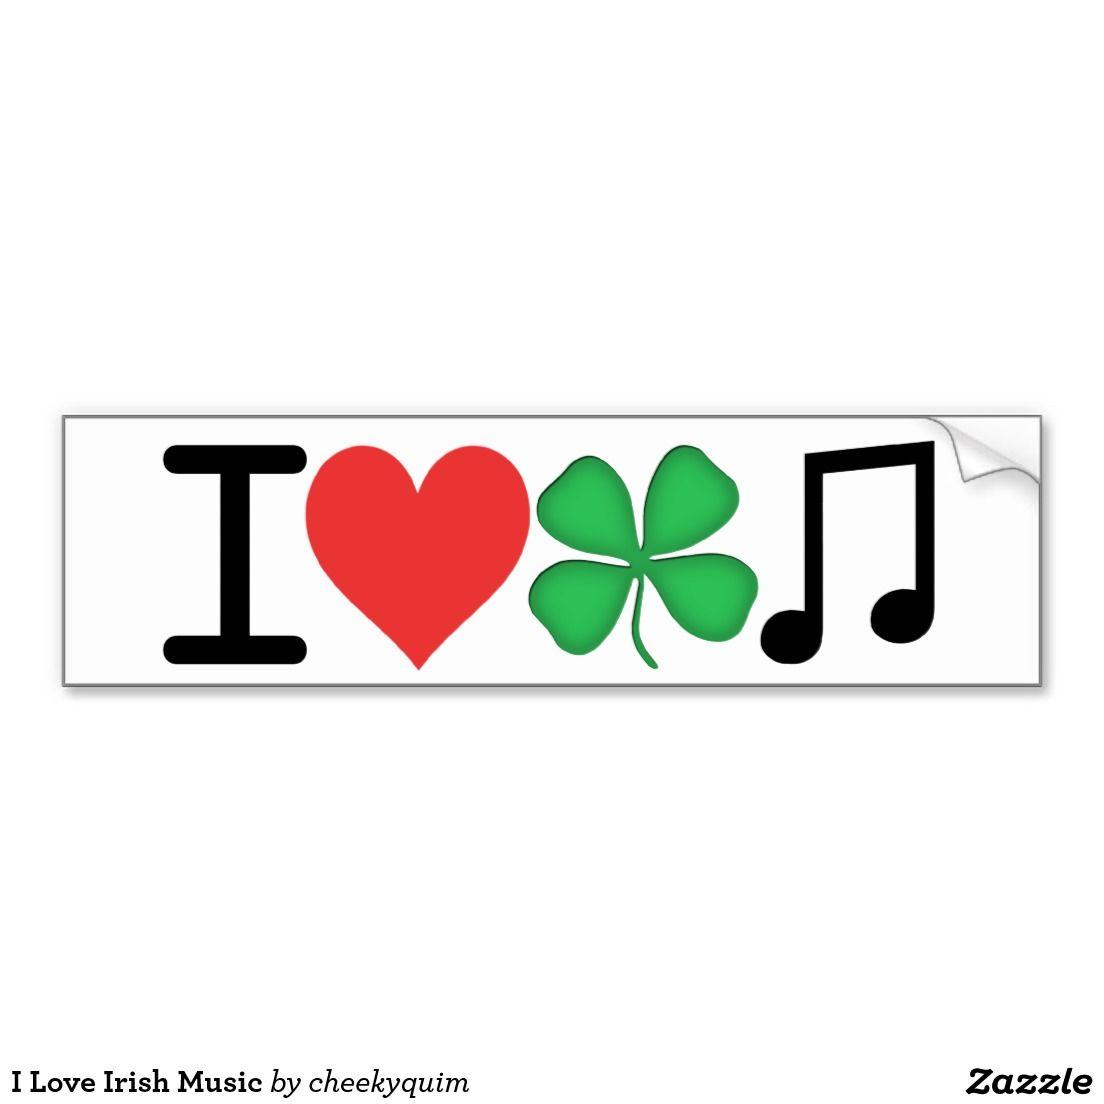 I Love Irish Music Bumper Sticker Zazzle Com Irish Music Music Stickers Bumper Stickers [ 1104 x 1104 Pixel ]